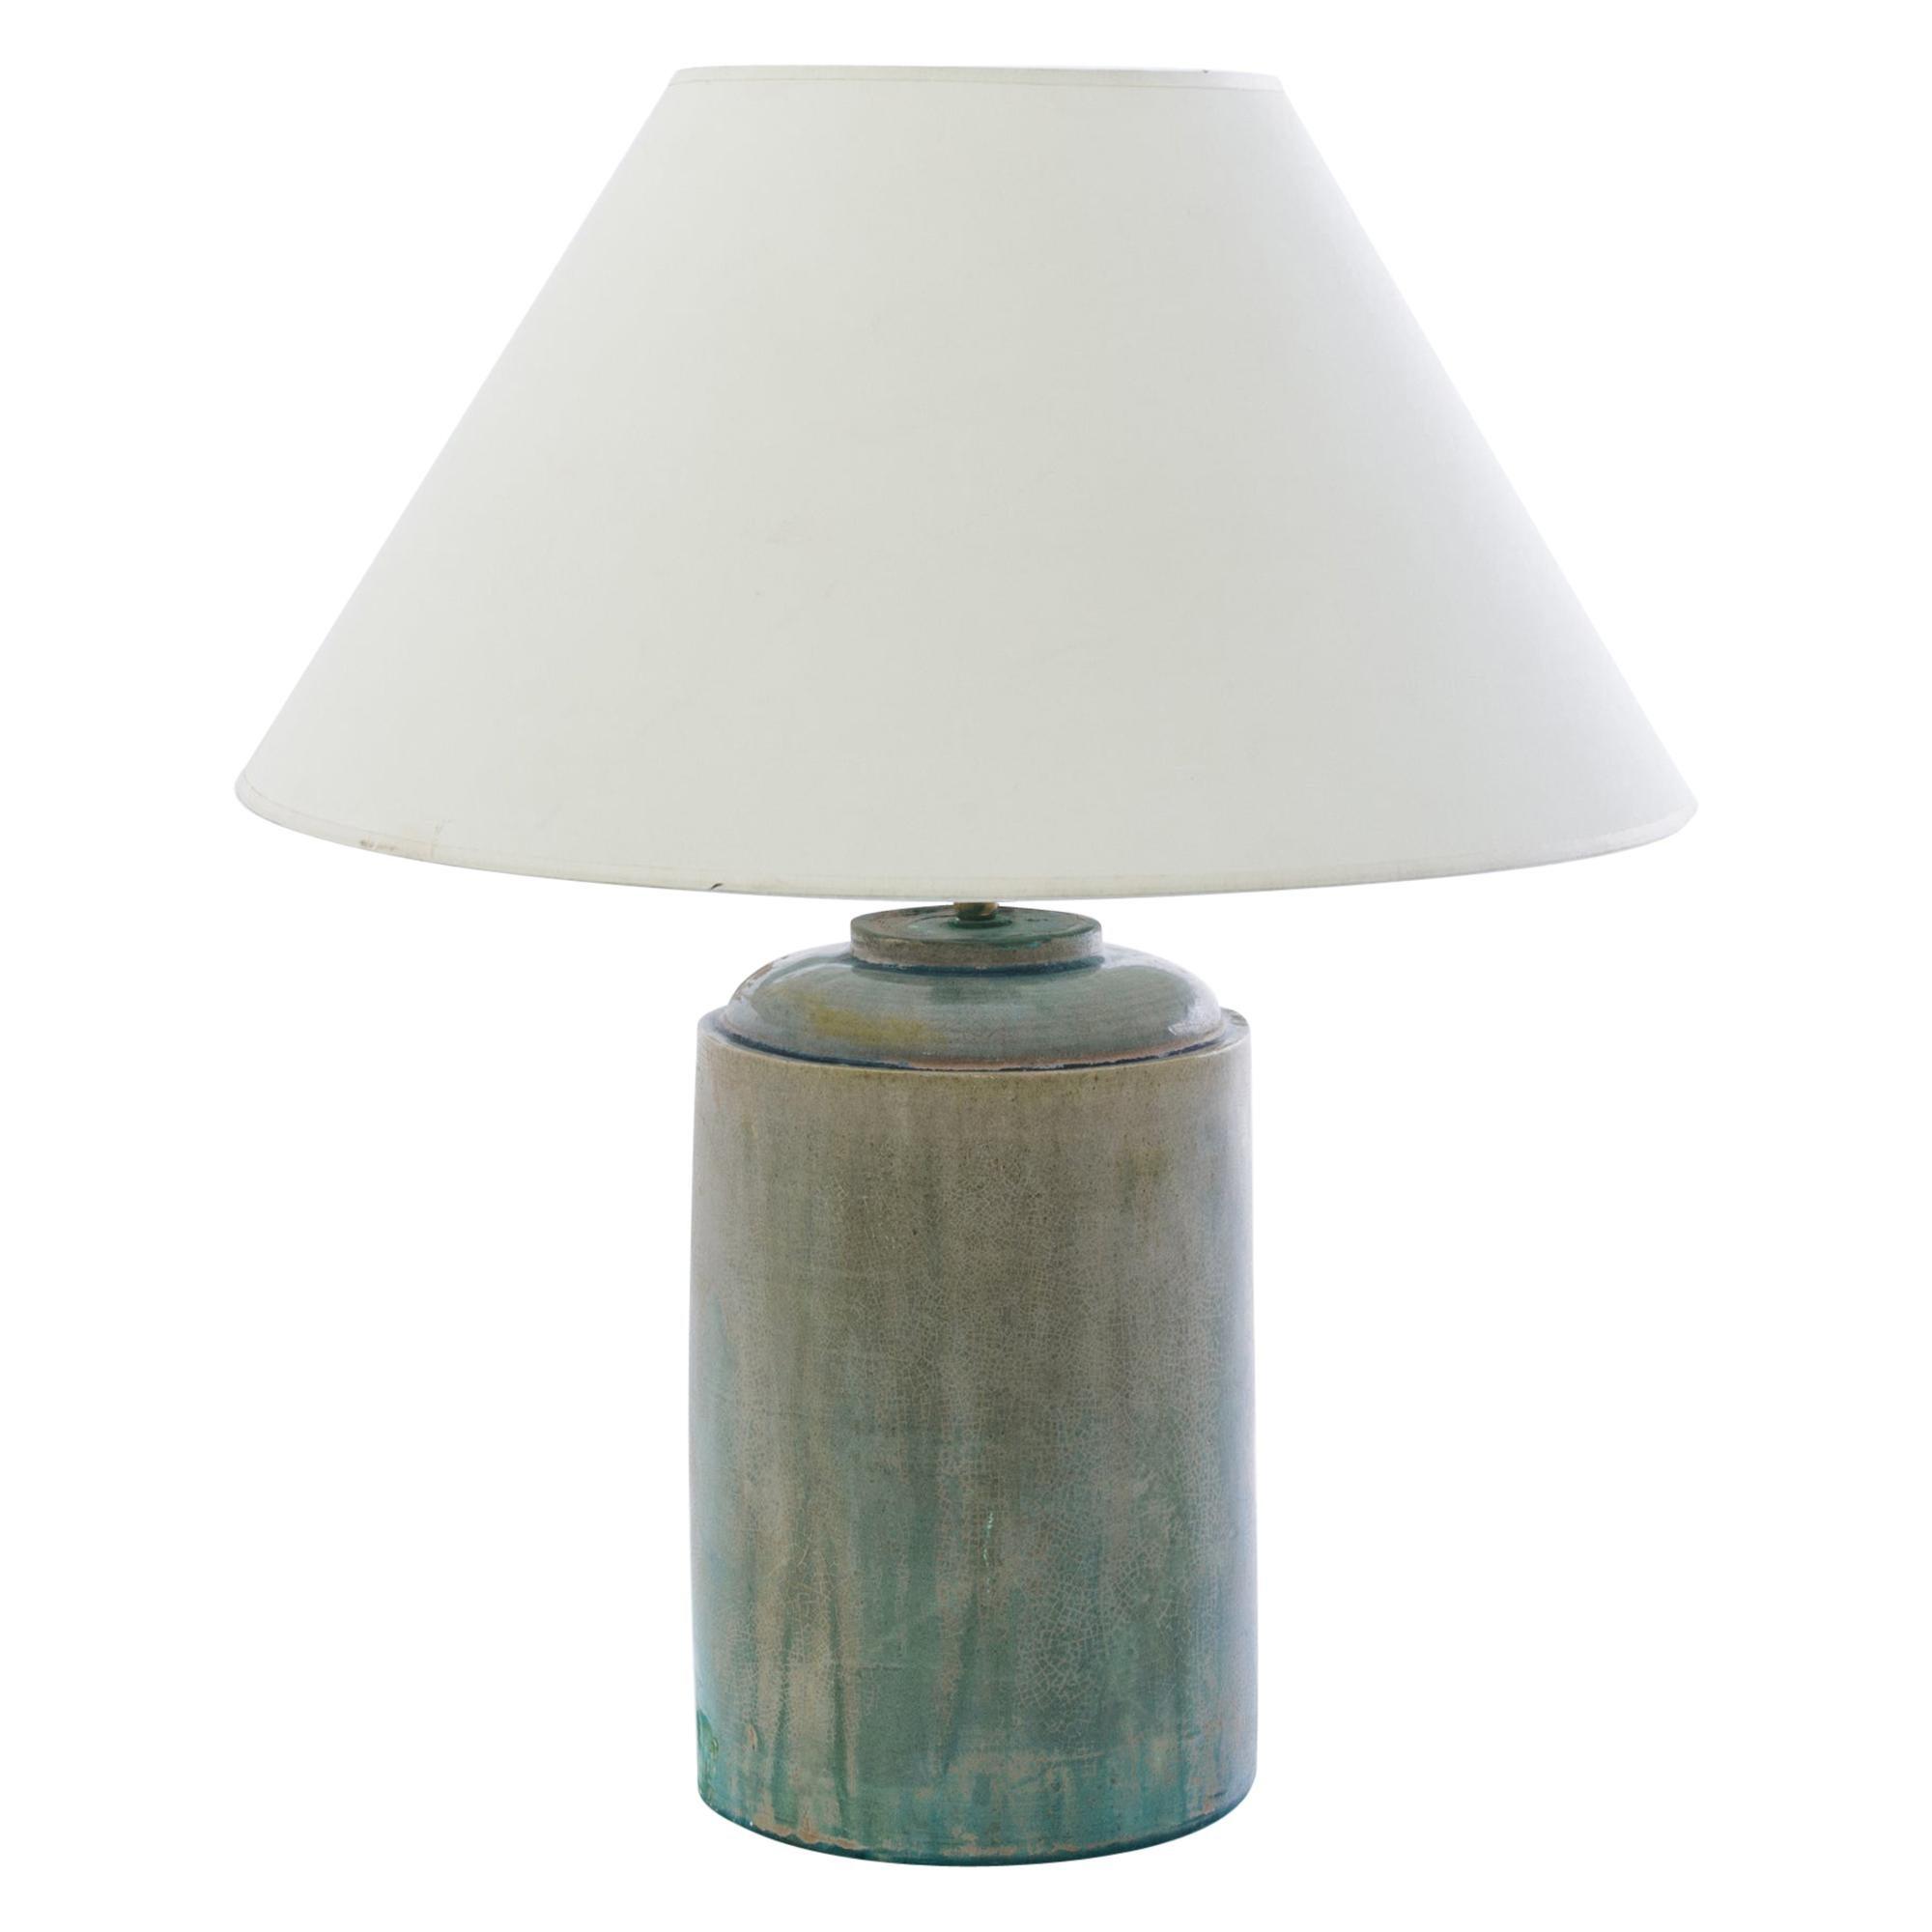 Antique Chinese Celadon Sunset Ceramic Vase Table Lamp